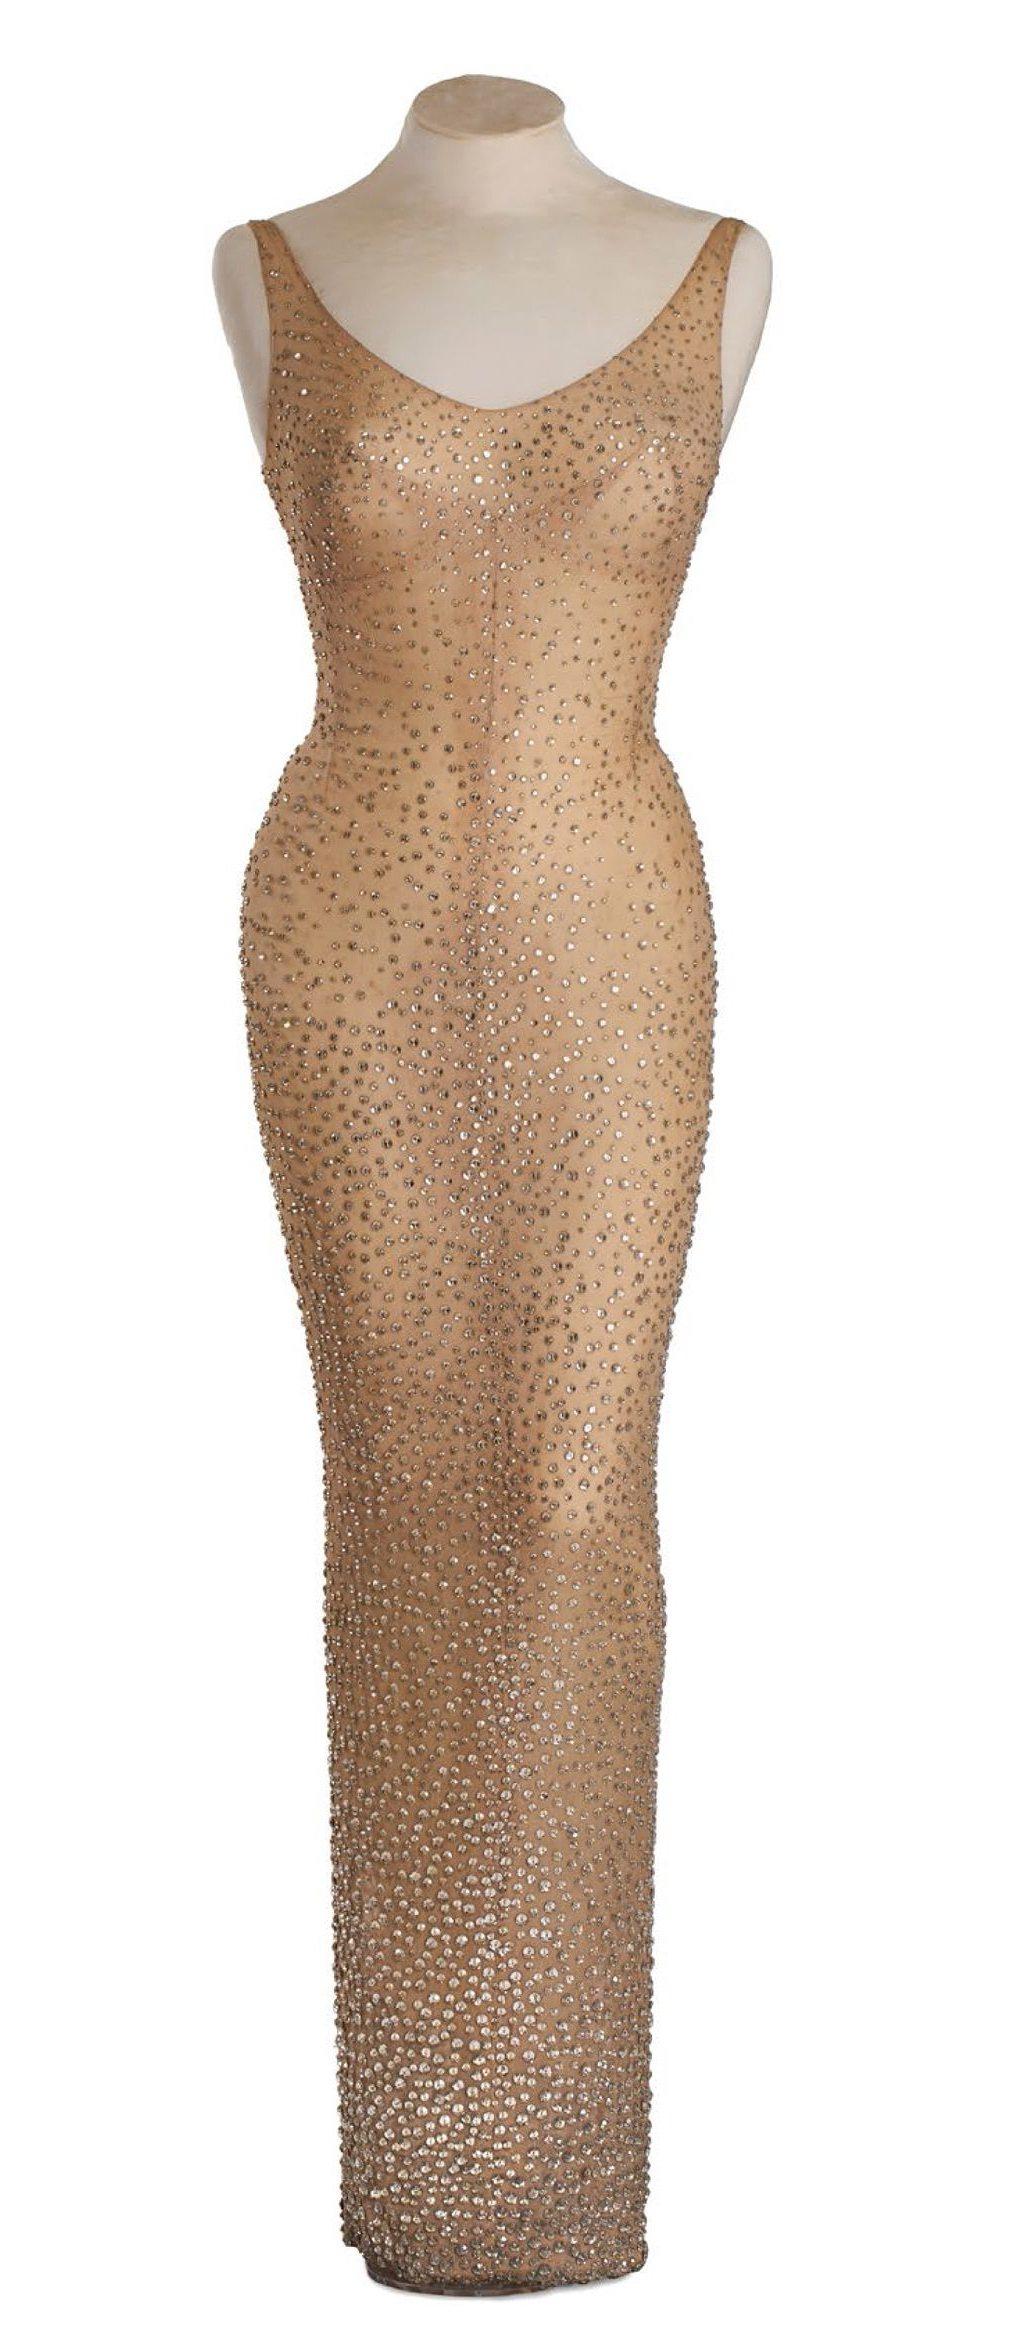 Marilyn Monroe's Kennedy Dress Sells for $4 8 Million